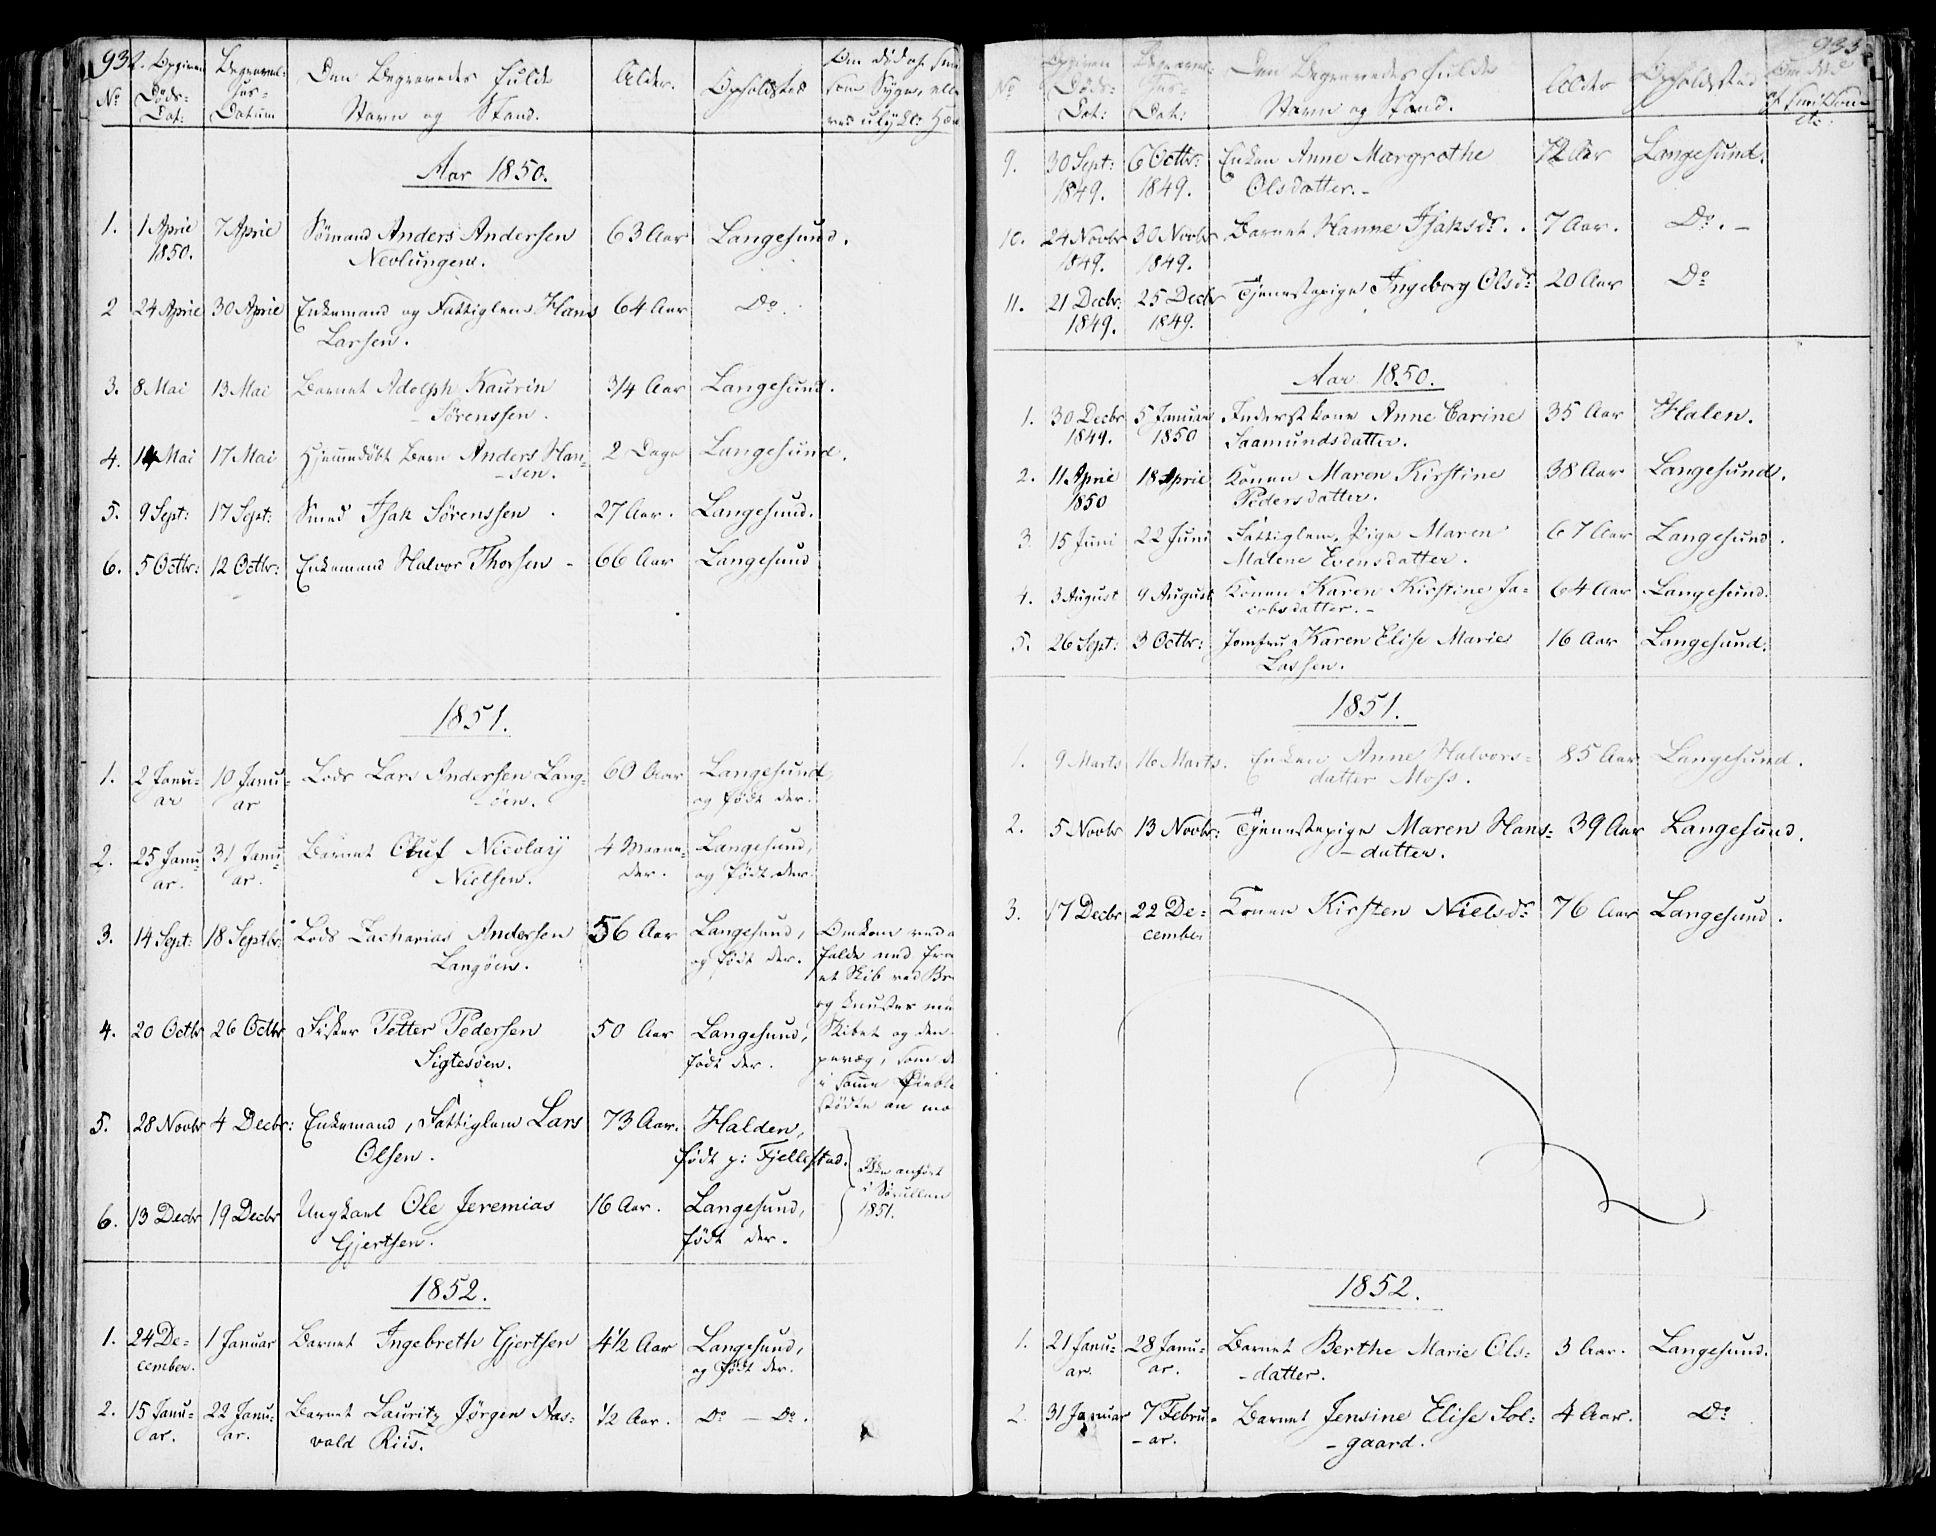 SAKO, Bamble kirkebøker, F/Fa/L0004: Ministerialbok nr. I 4, 1834-1853, s. 932-933